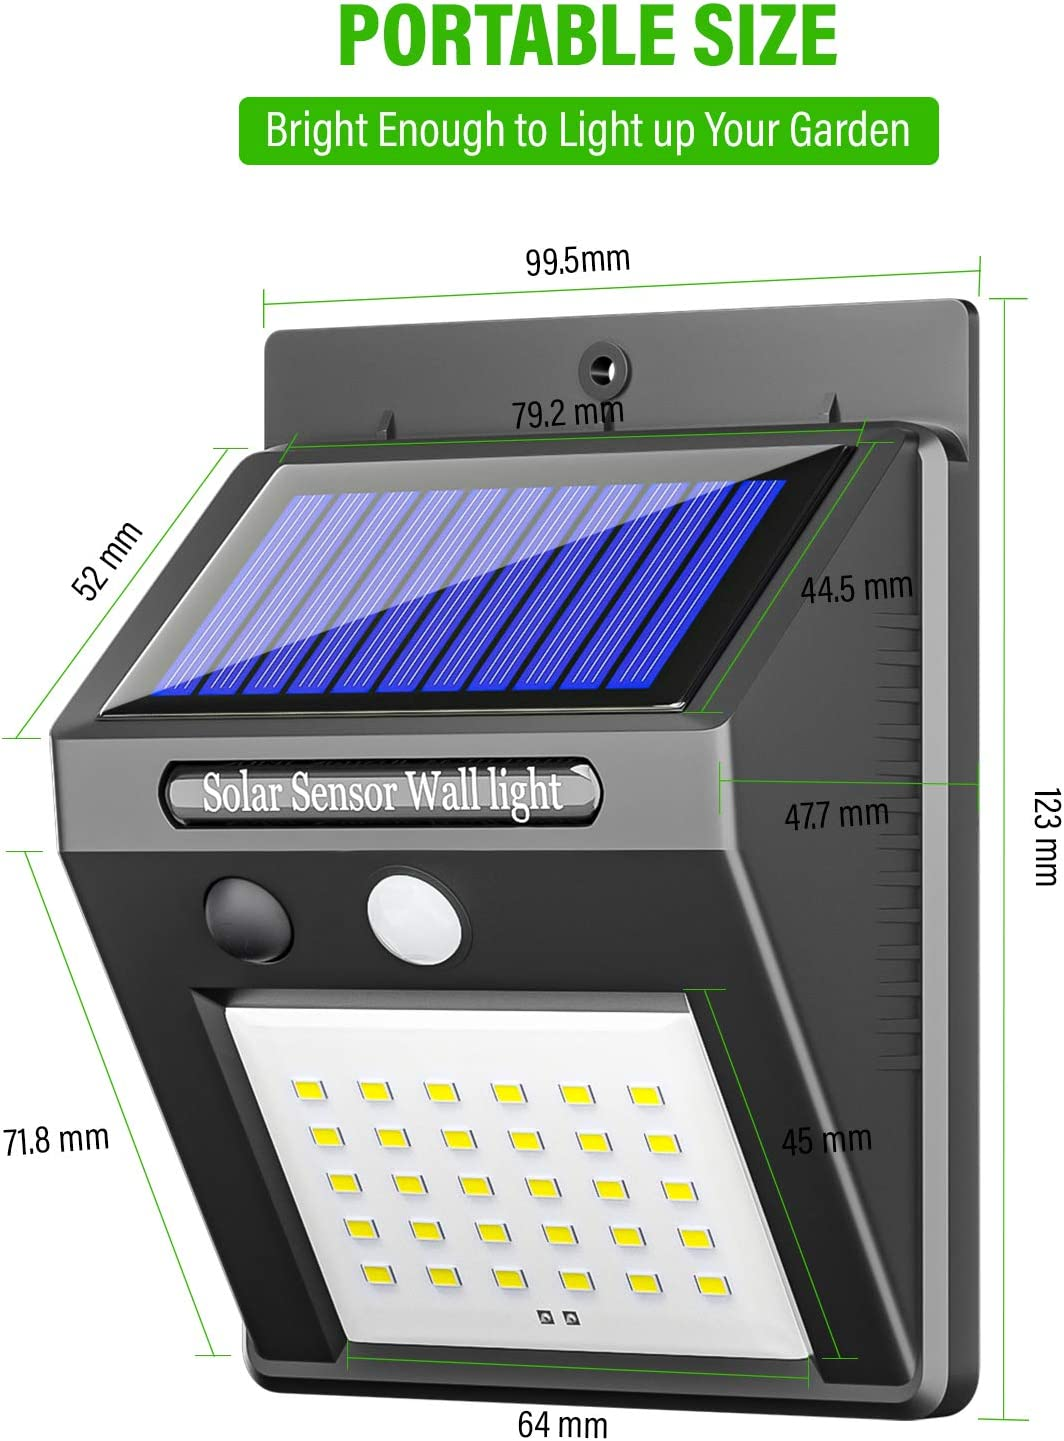 iToncs Luces solares para exteriores luz de seguridad luces de pared para jard/ín impermeables con sensor de movimiento inal/ámbrico funciona con energ/ía solar 2 unidades